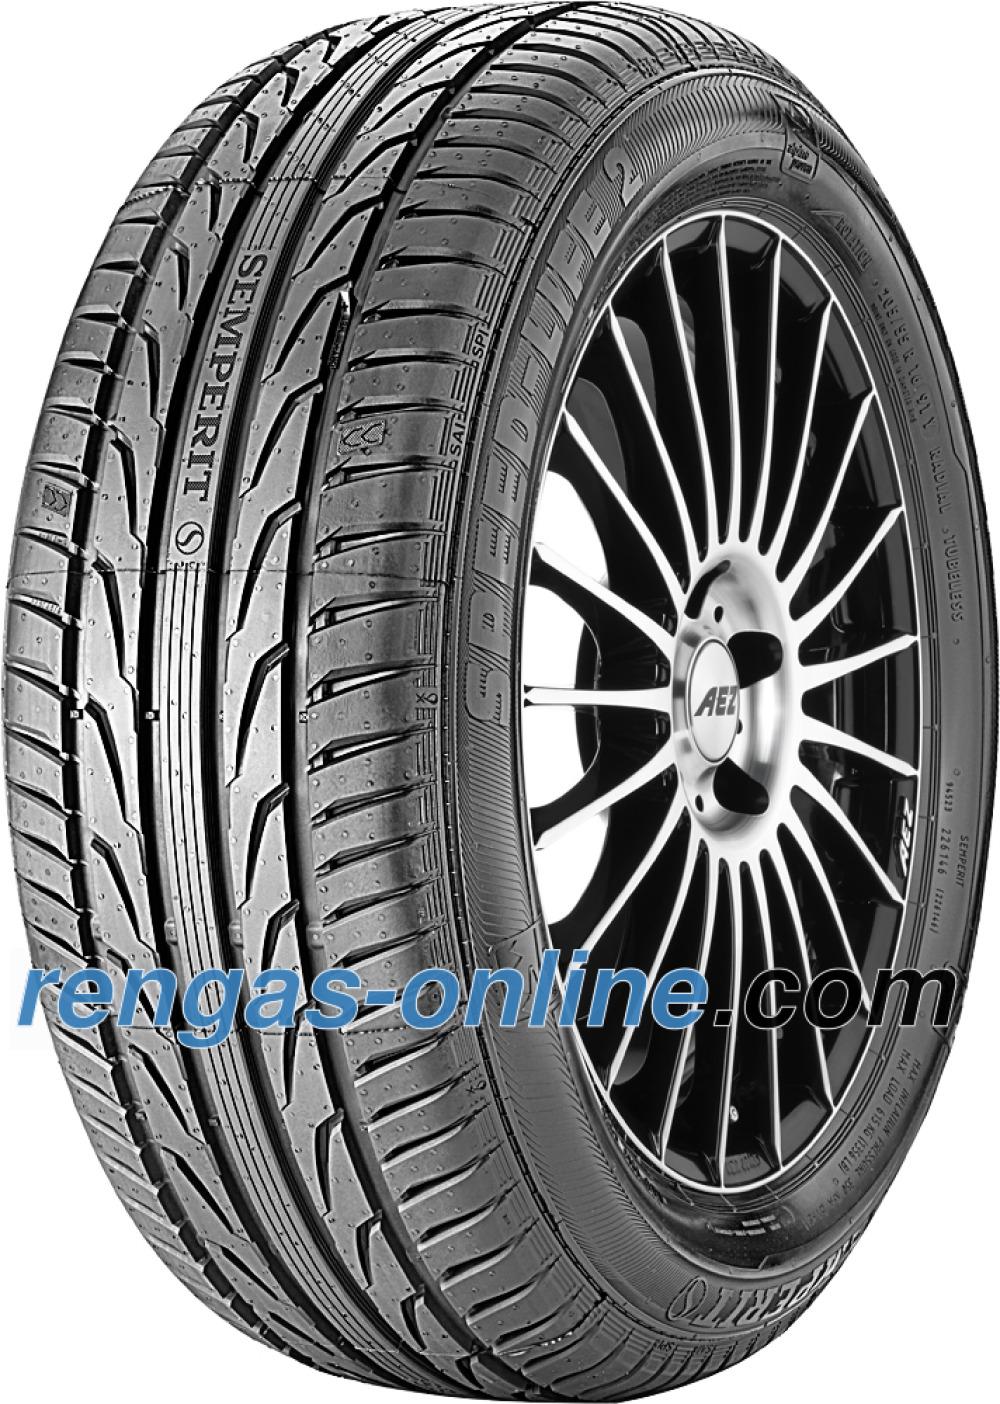 semperit-speed-life-2-21555-r17-94y-vannealueen-ripalla